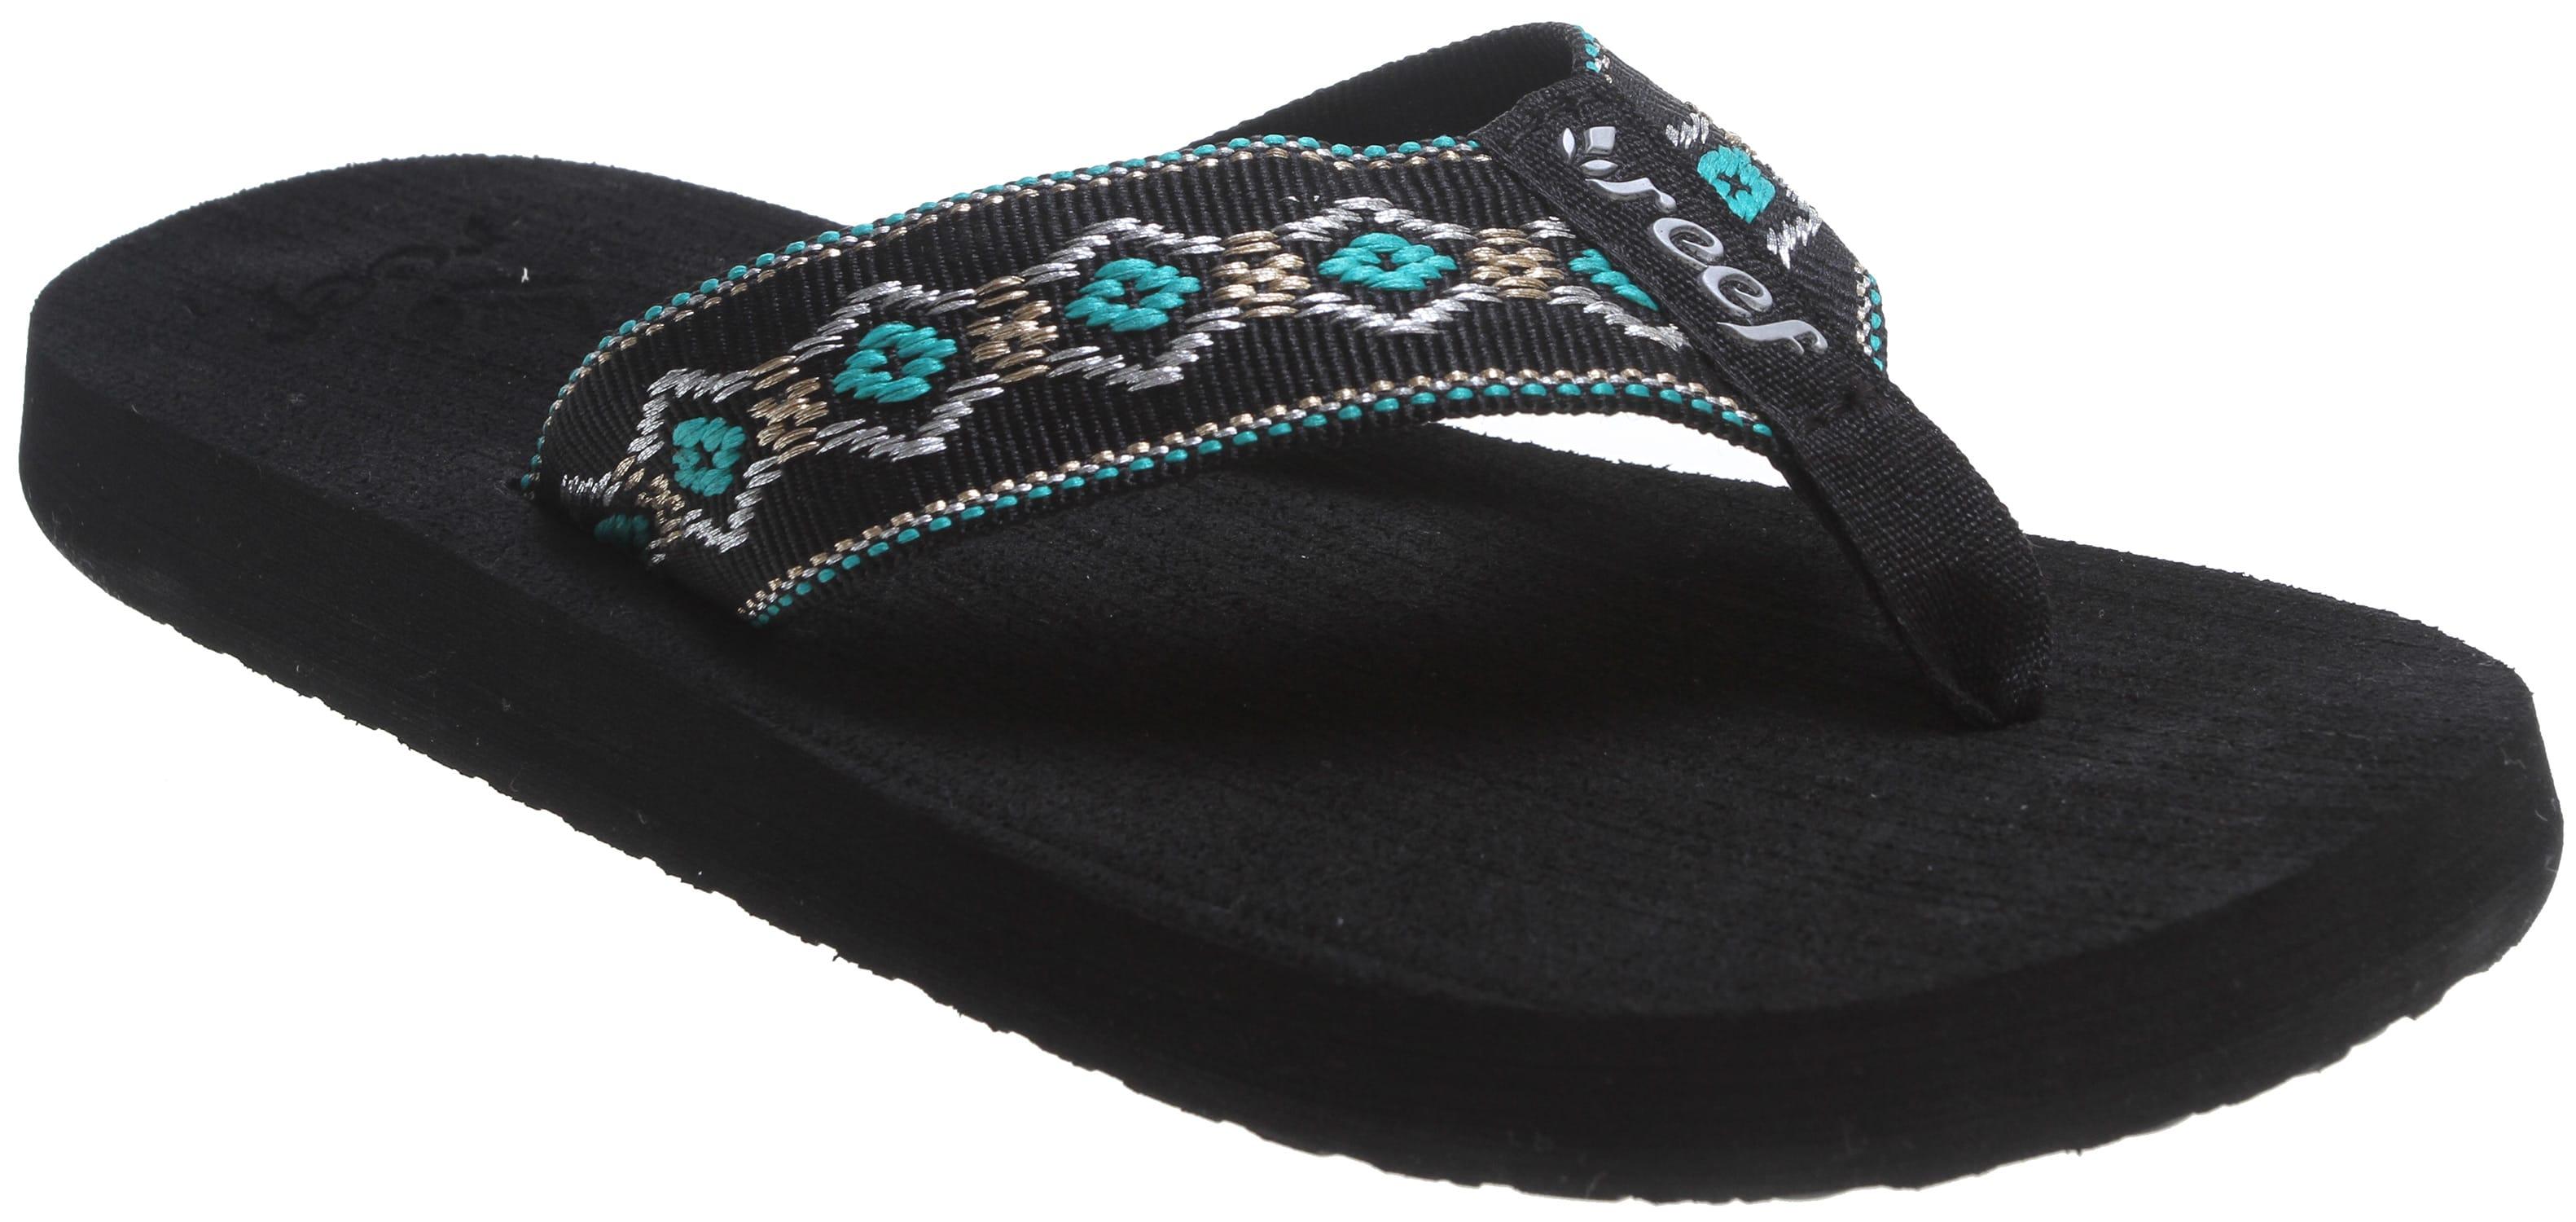 859b7917848f Reef Sandy Sandals - thumbnail 2